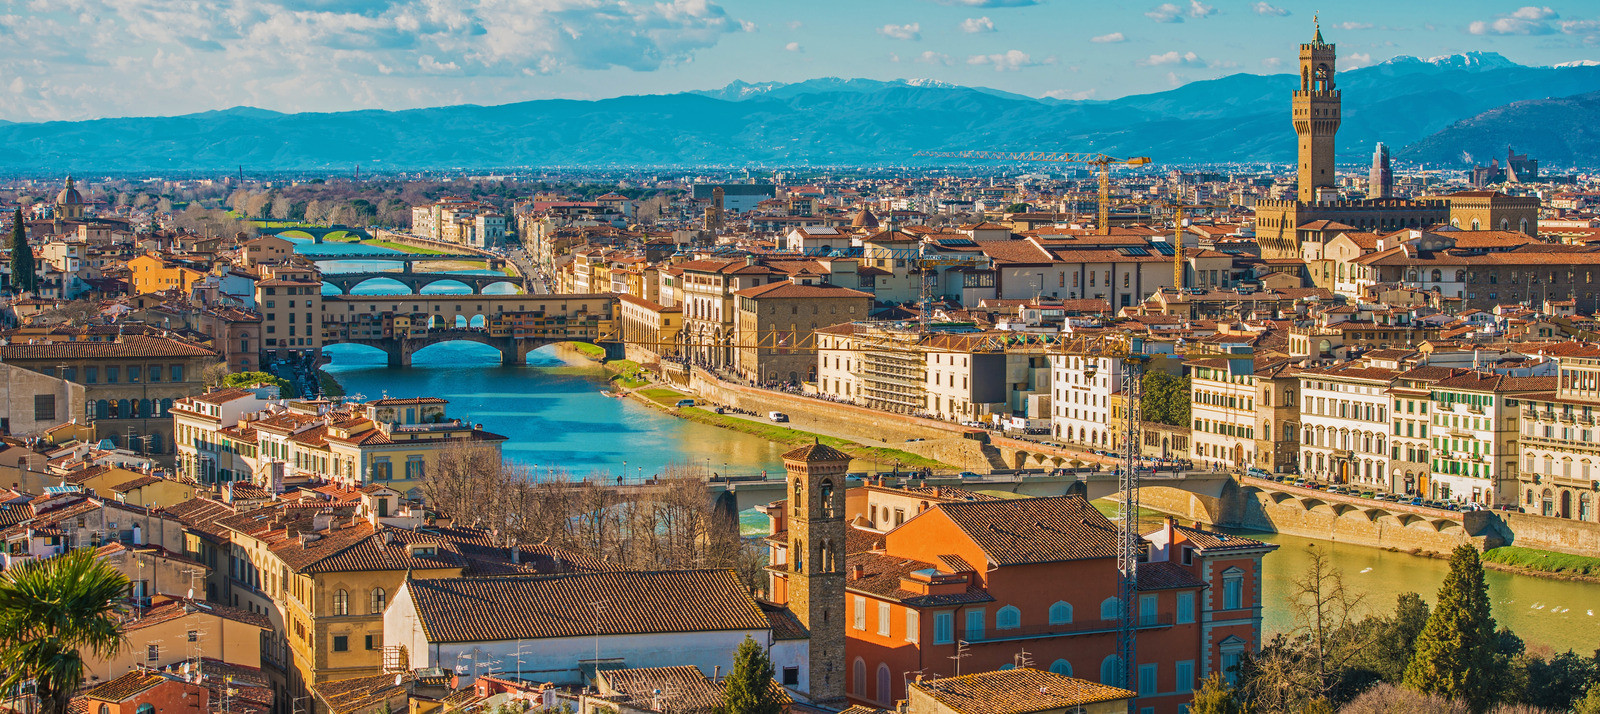 Canva - Florence Cityscape Panorama.jpg